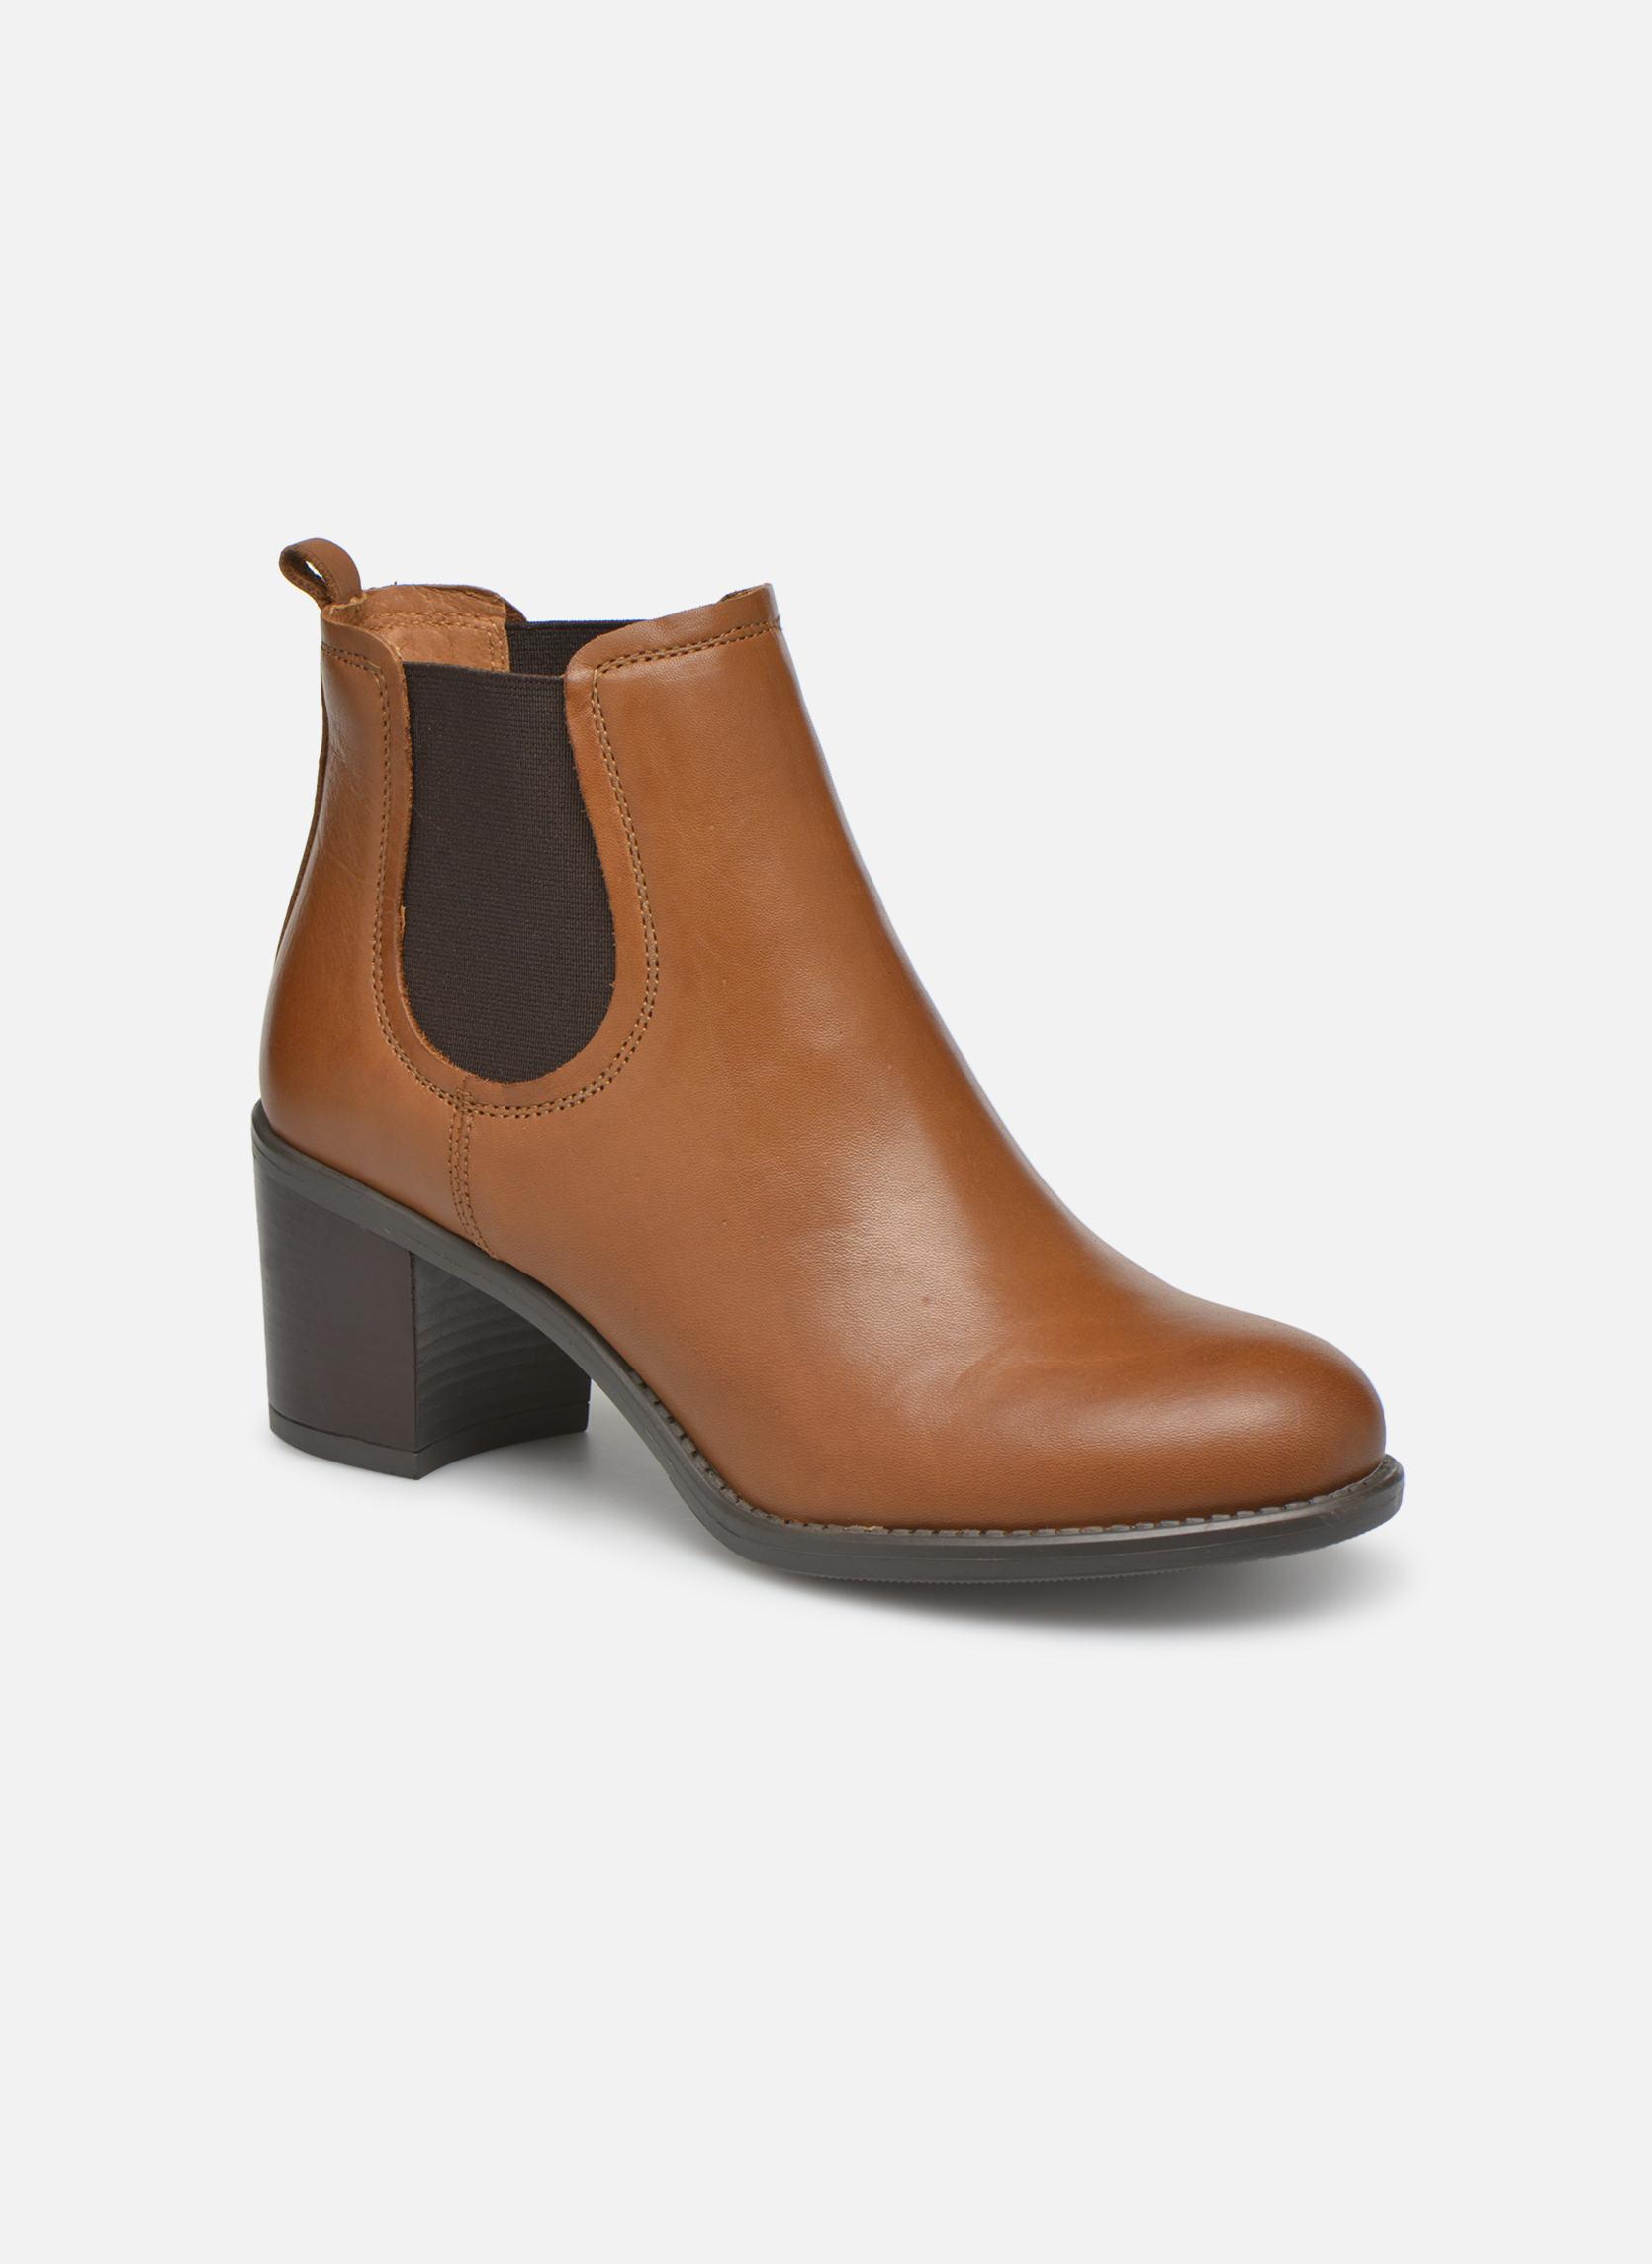 Grandes descuentos últimos zapatos Georgia Rose Analla (Marrón) - Botines  Descuento